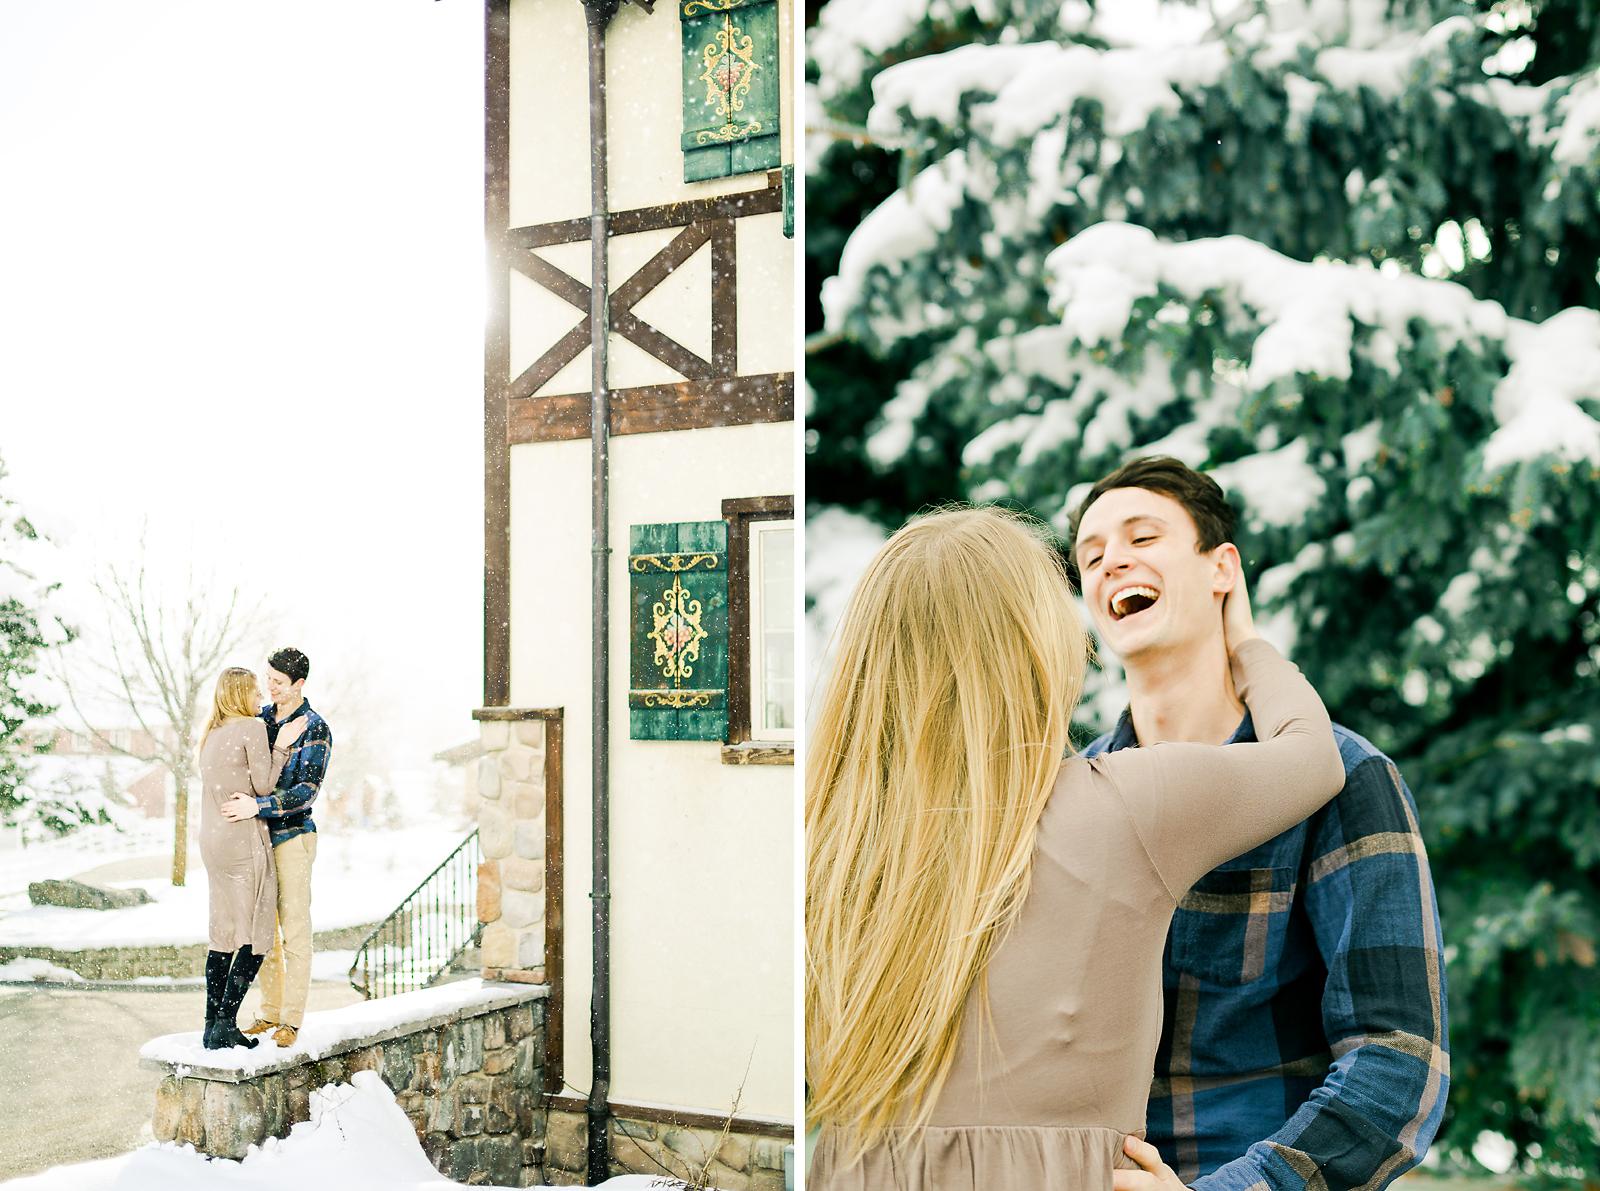 winter_wedding_anniversary_pictures_008.jpg